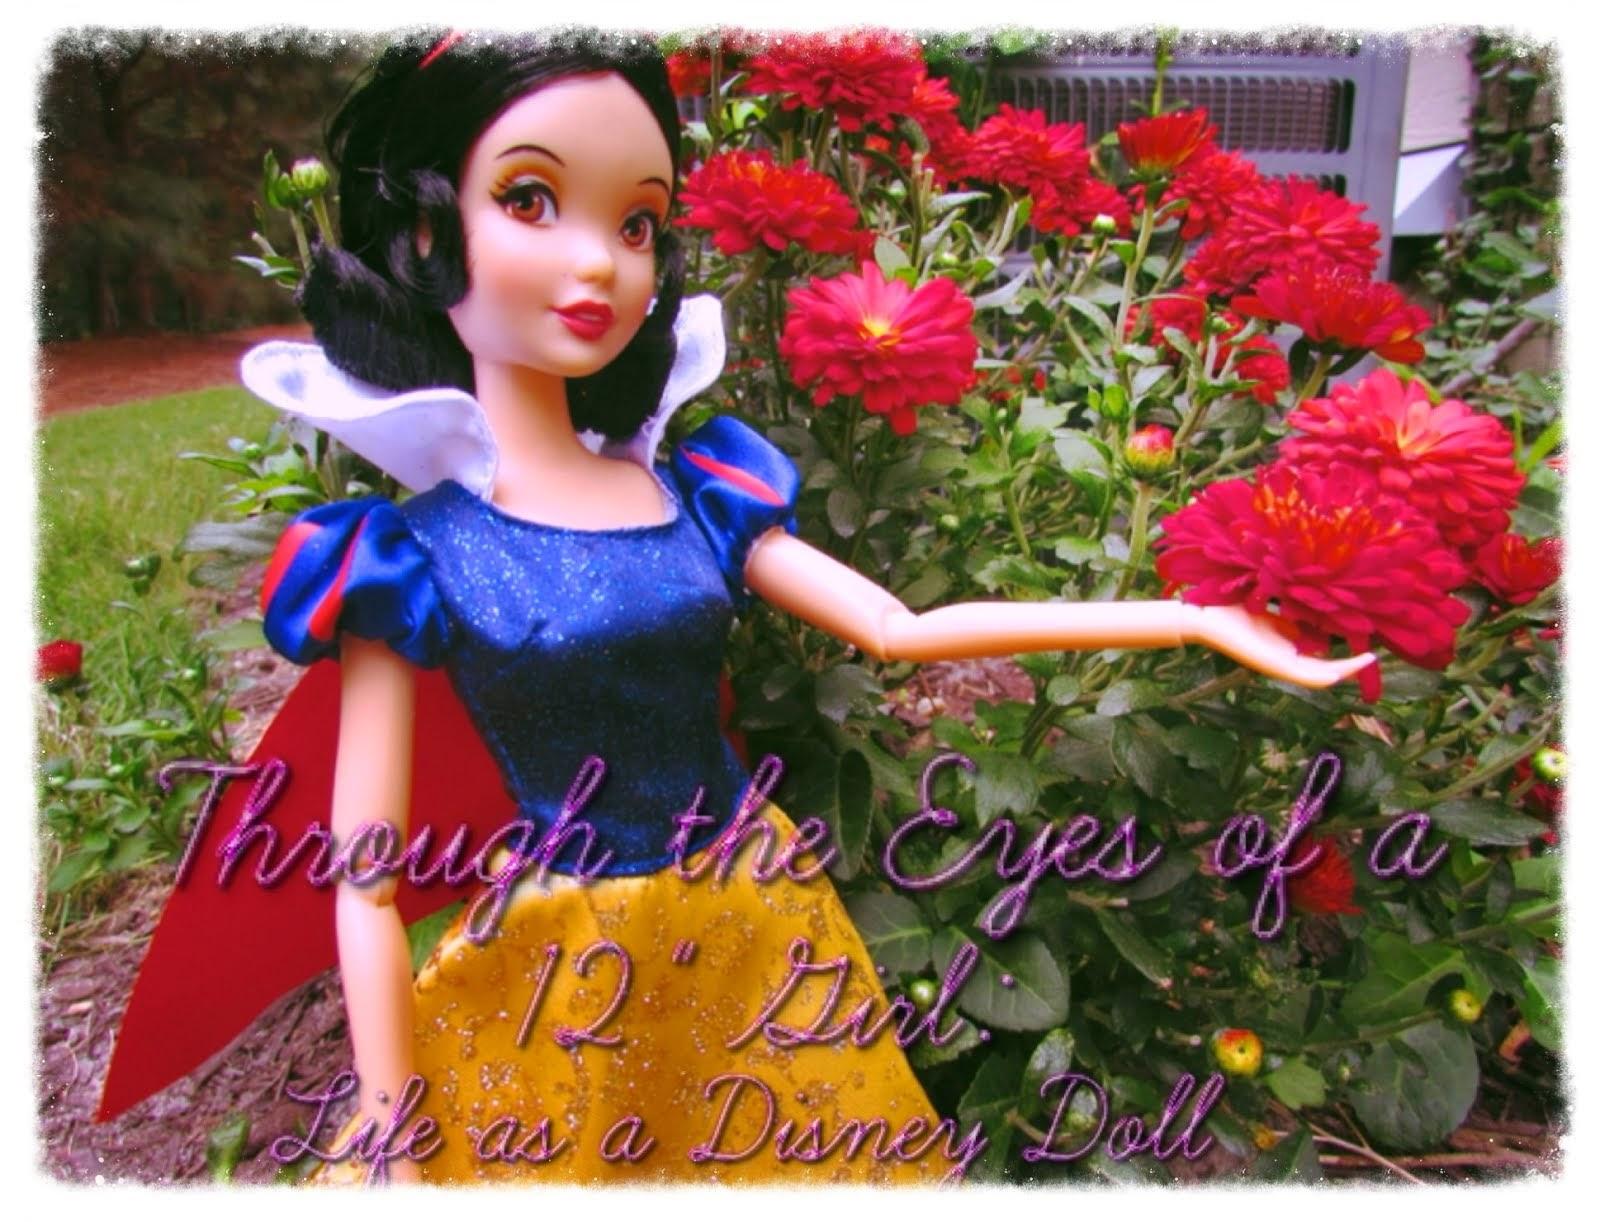 "Through the Eyes of a 12"" Girl: Life as a Disney Doll"